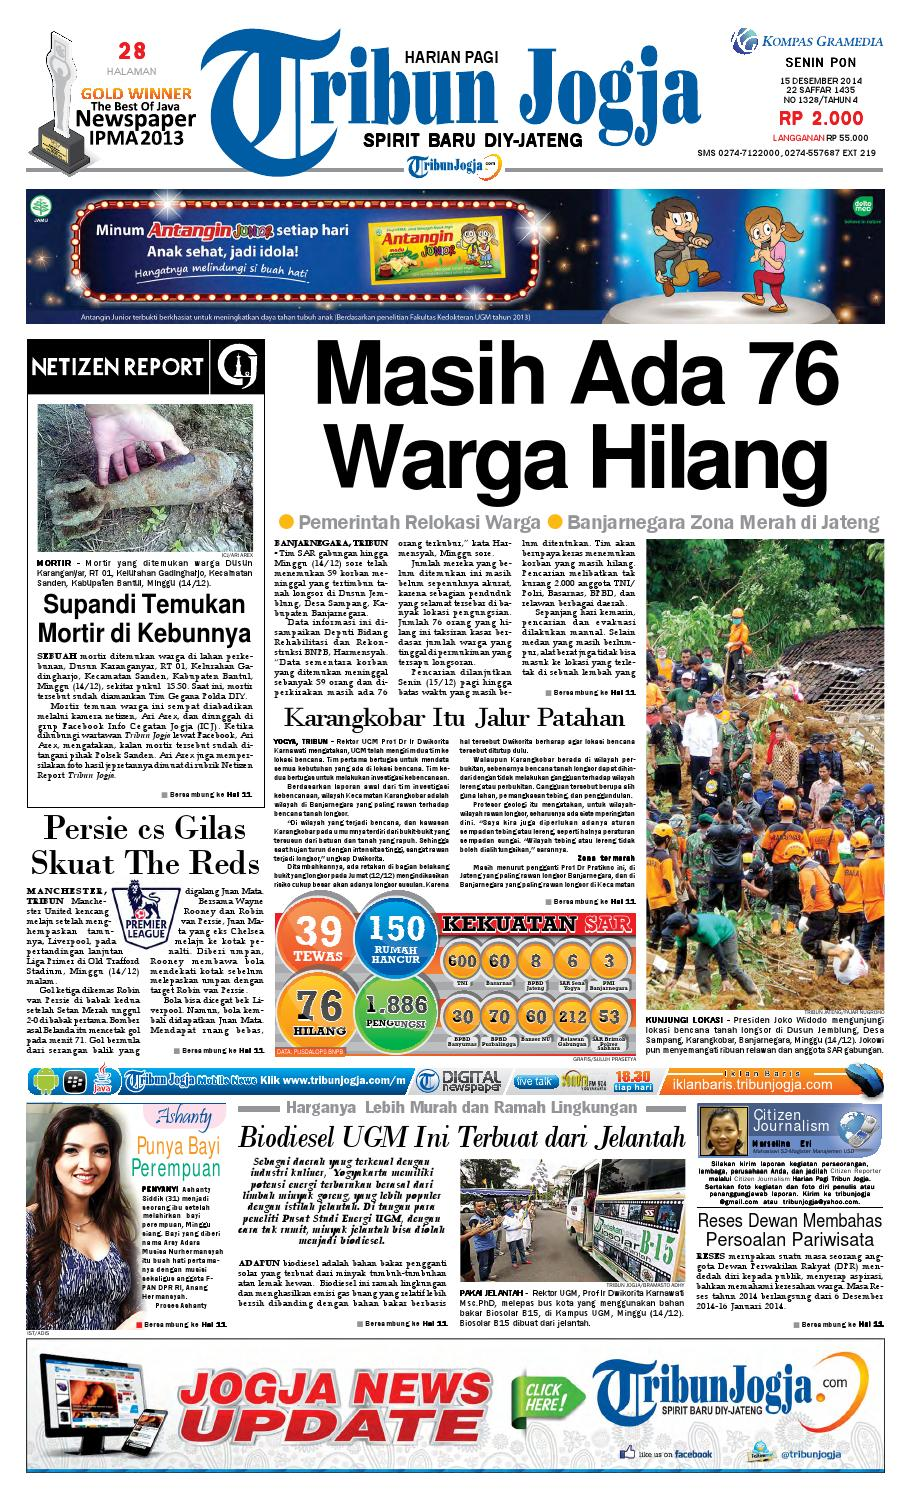 Tribunjogja 15 12 2014 By Tribun Jogja Issuu Kue Mawar Nuris Bakeri Ampamp Caterring Akumandiri